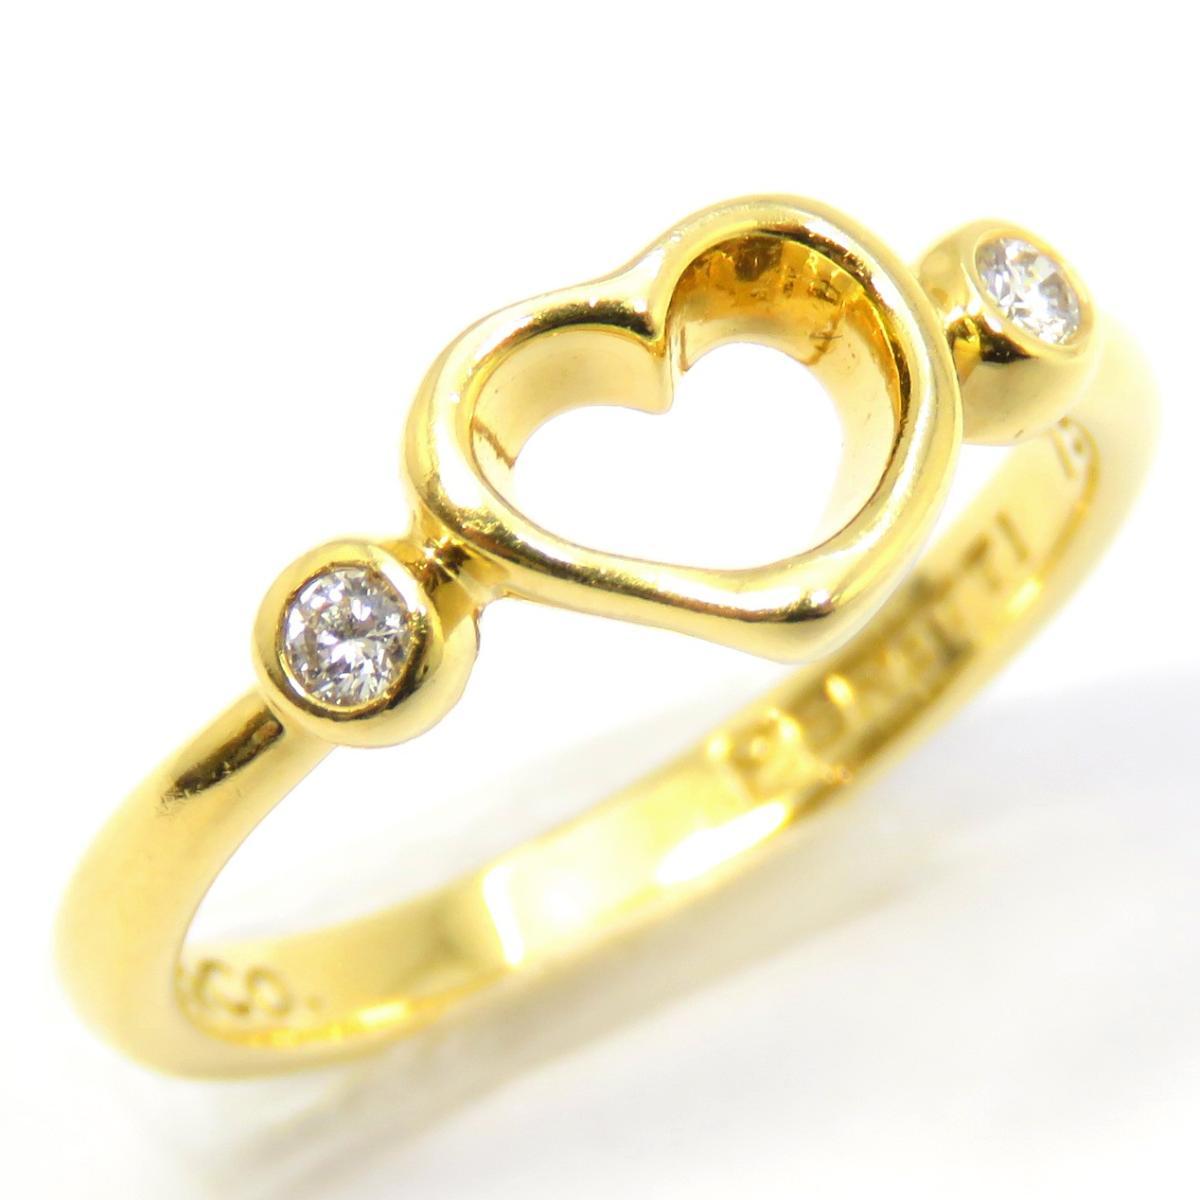 TIFFANY&CO(ティファニー)/オープンハートリング 2Pダイヤ 指輪/リング//K18YG(750)イエローゴールド×ダイヤモンド/【ランクA】/9号【中古】